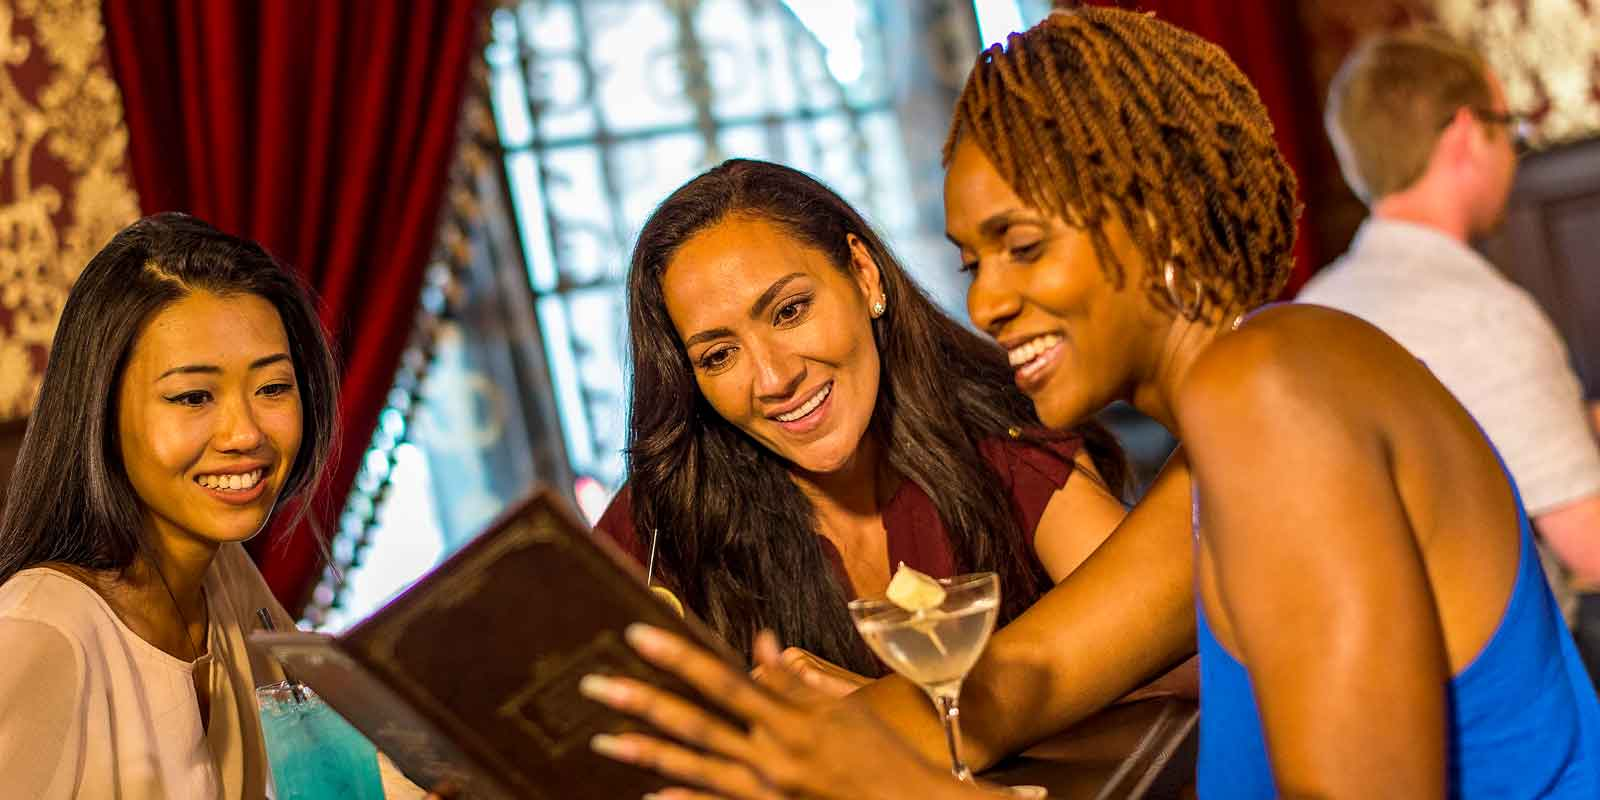 Three women peruse a drink menu at Disney Boardwalk's AbracadaBar.